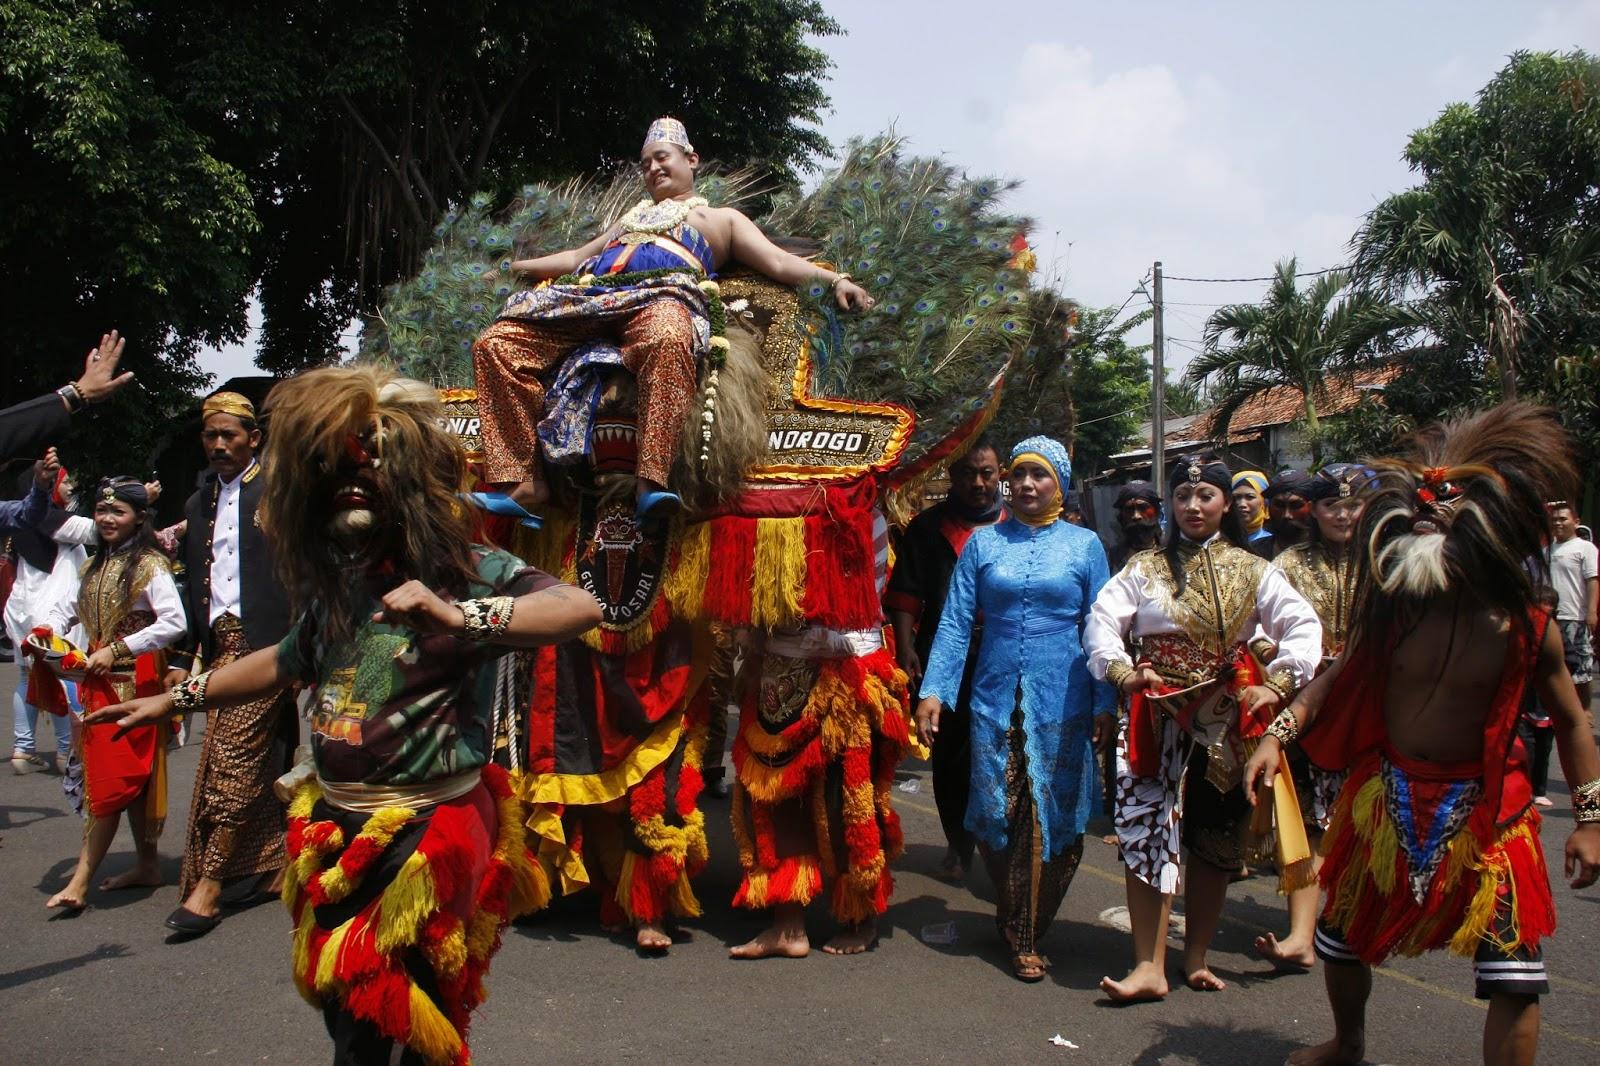 Mengenal Reog Ponorogo Jawa Timur Temanten Pria Digendong Oleh Singa